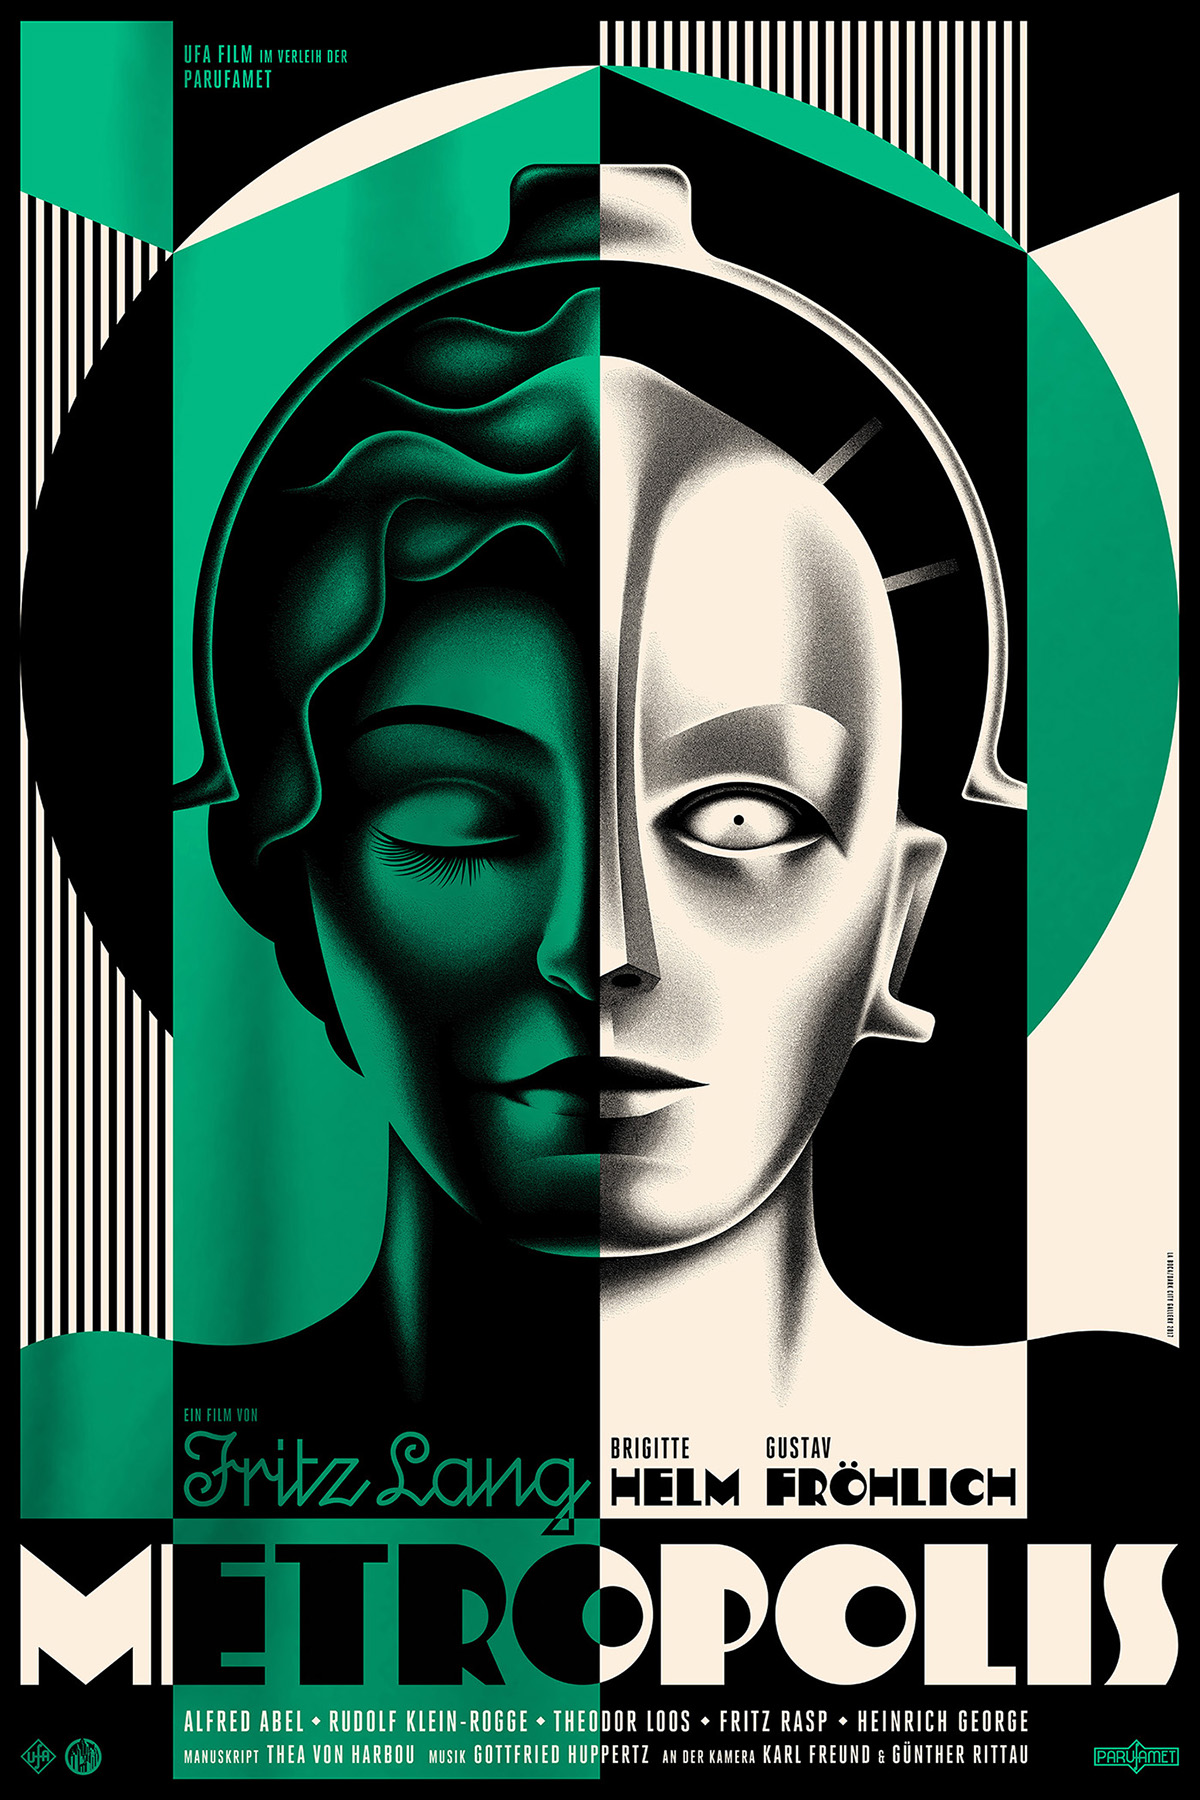 Metropolis Film Poster...